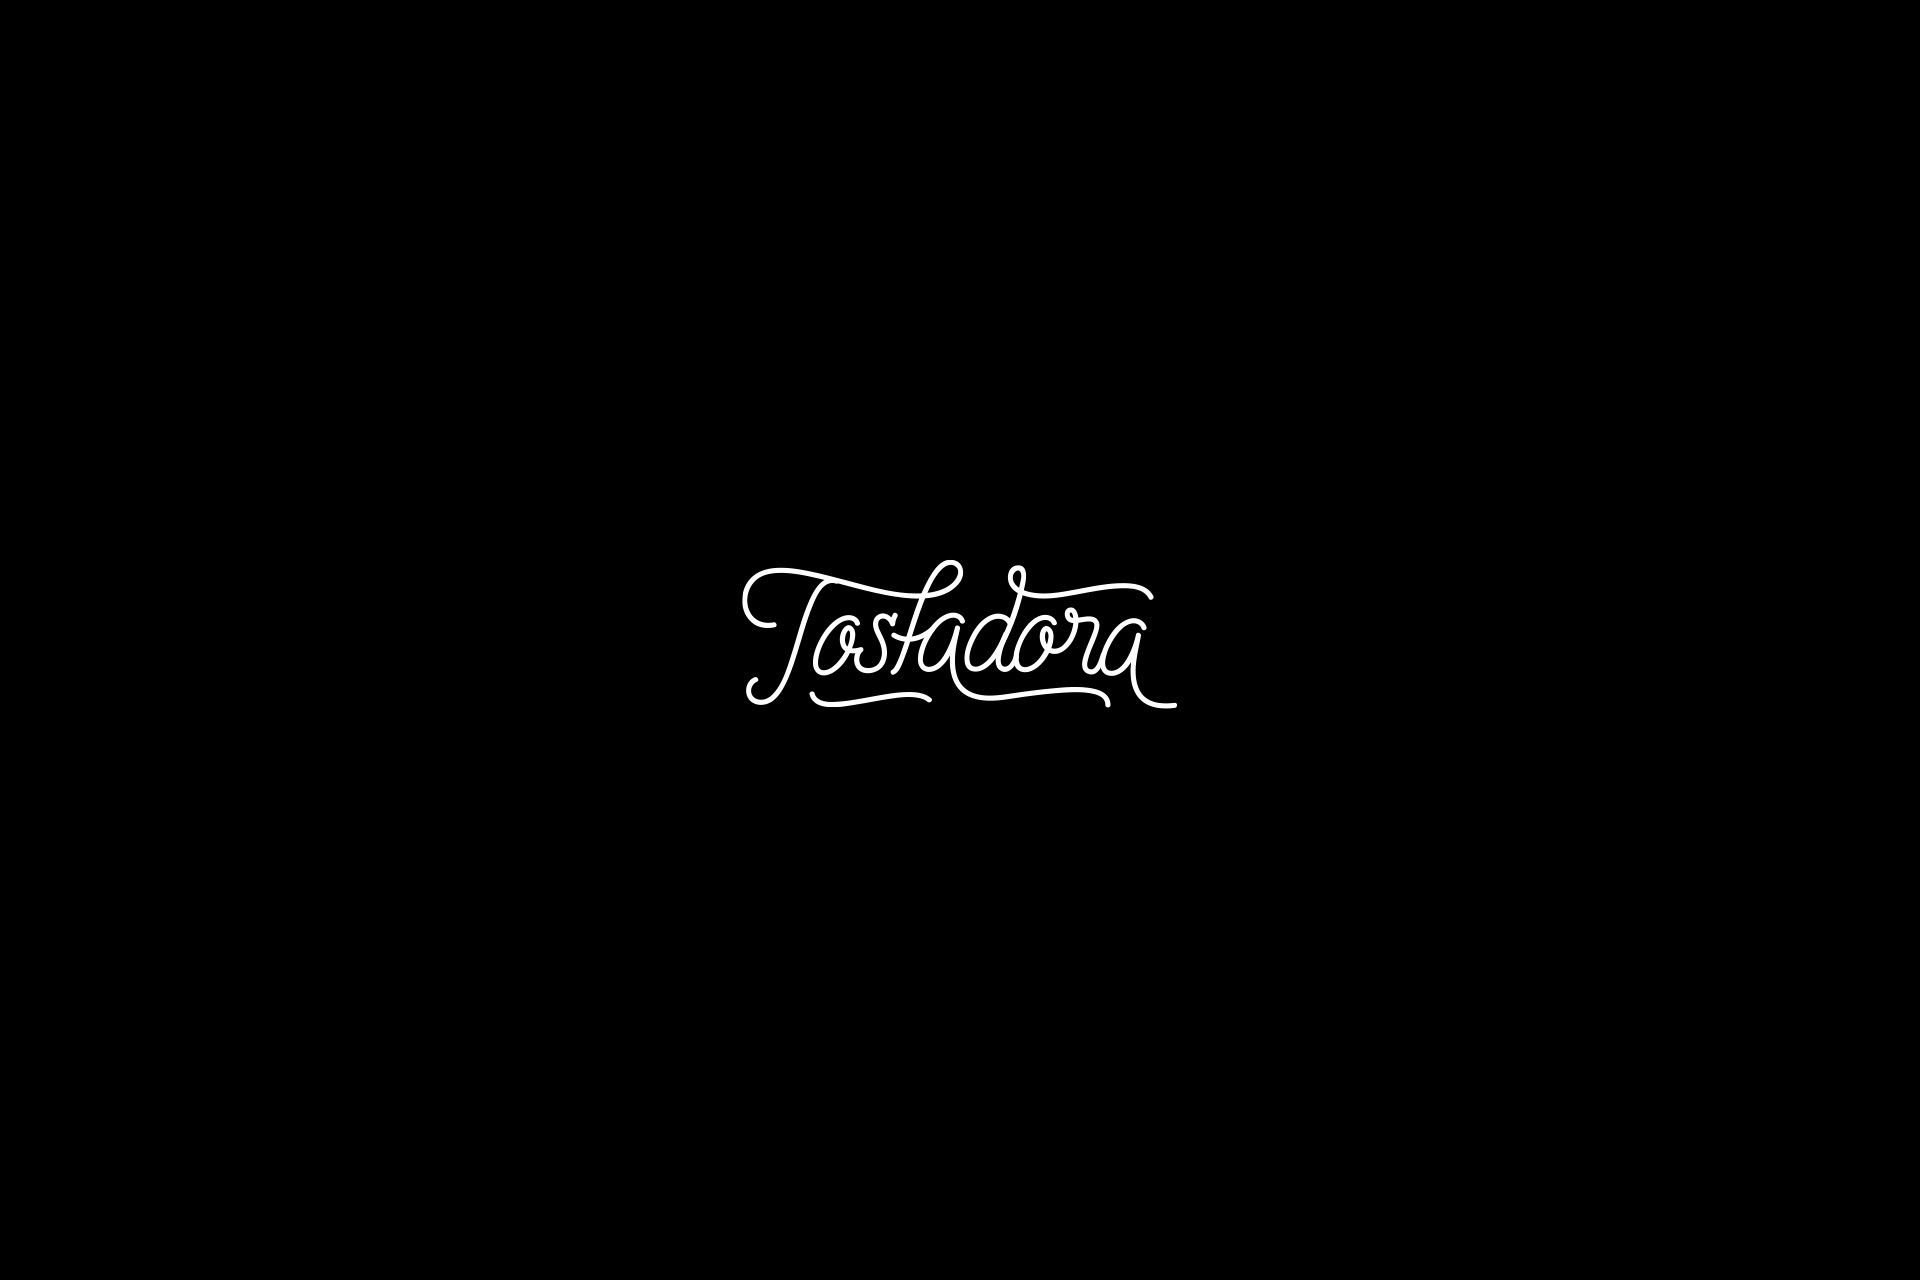 Logo_Tostadora_1920.jpg